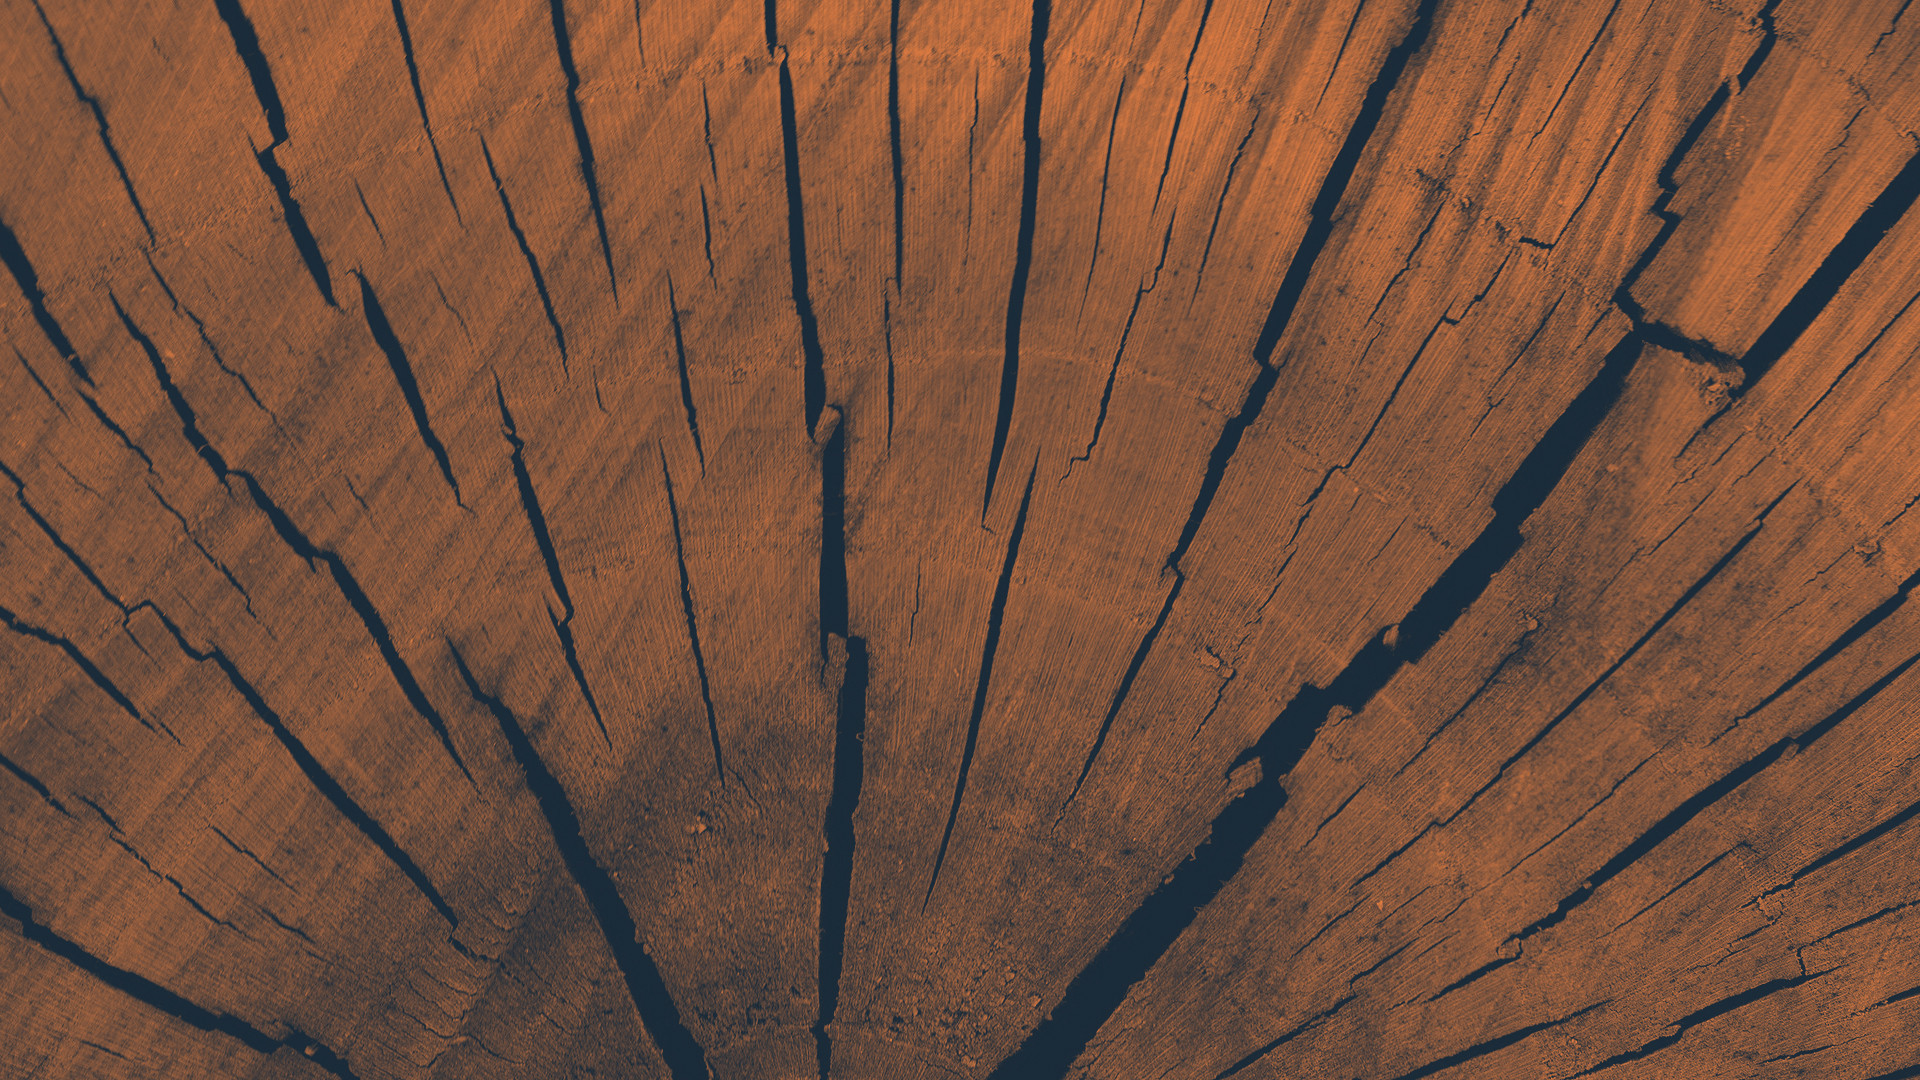 5-Elemente Organ Yoga | Element Holz